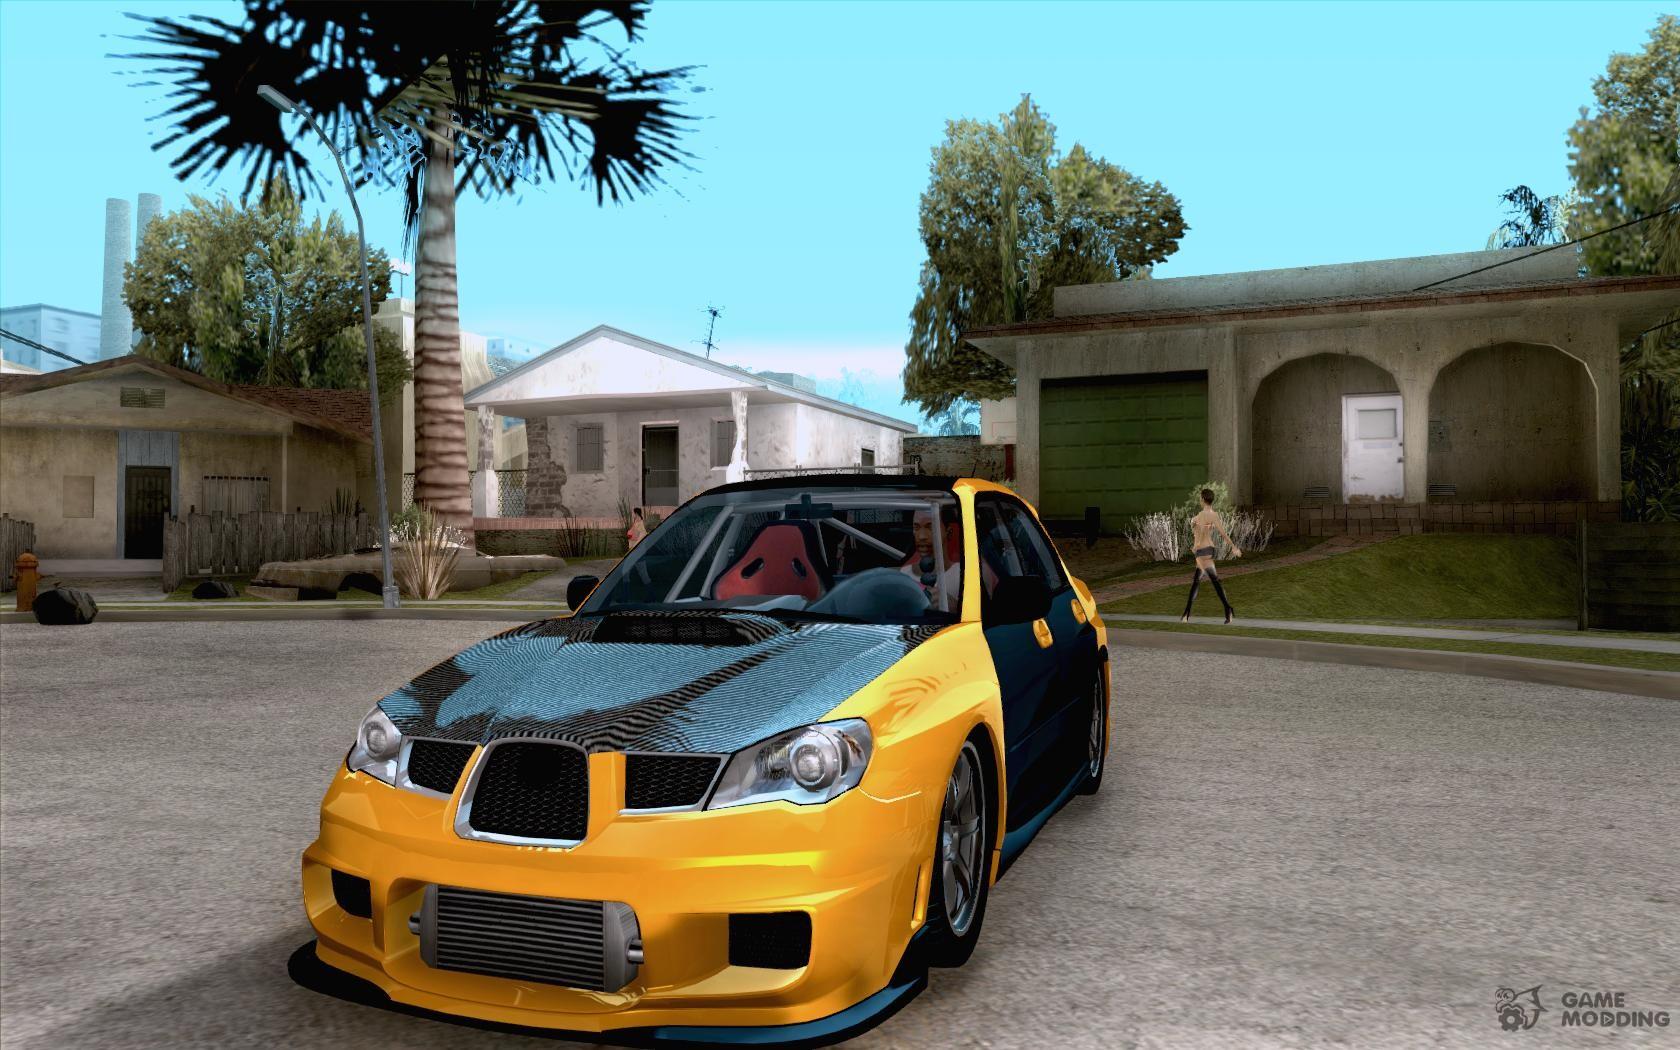 Subaru Impreza 2018 Tuning >> Subaru Impreza WRX Sti 2006 Elemental Attack (orange) for GTA San Andreas